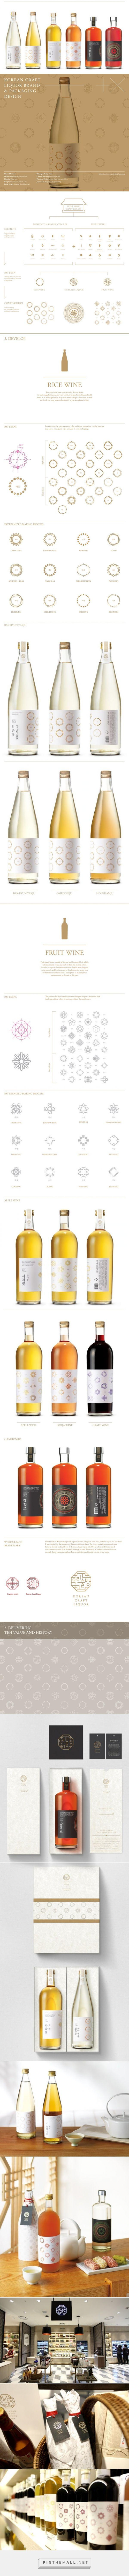 Shinsegae Traditional Liquor